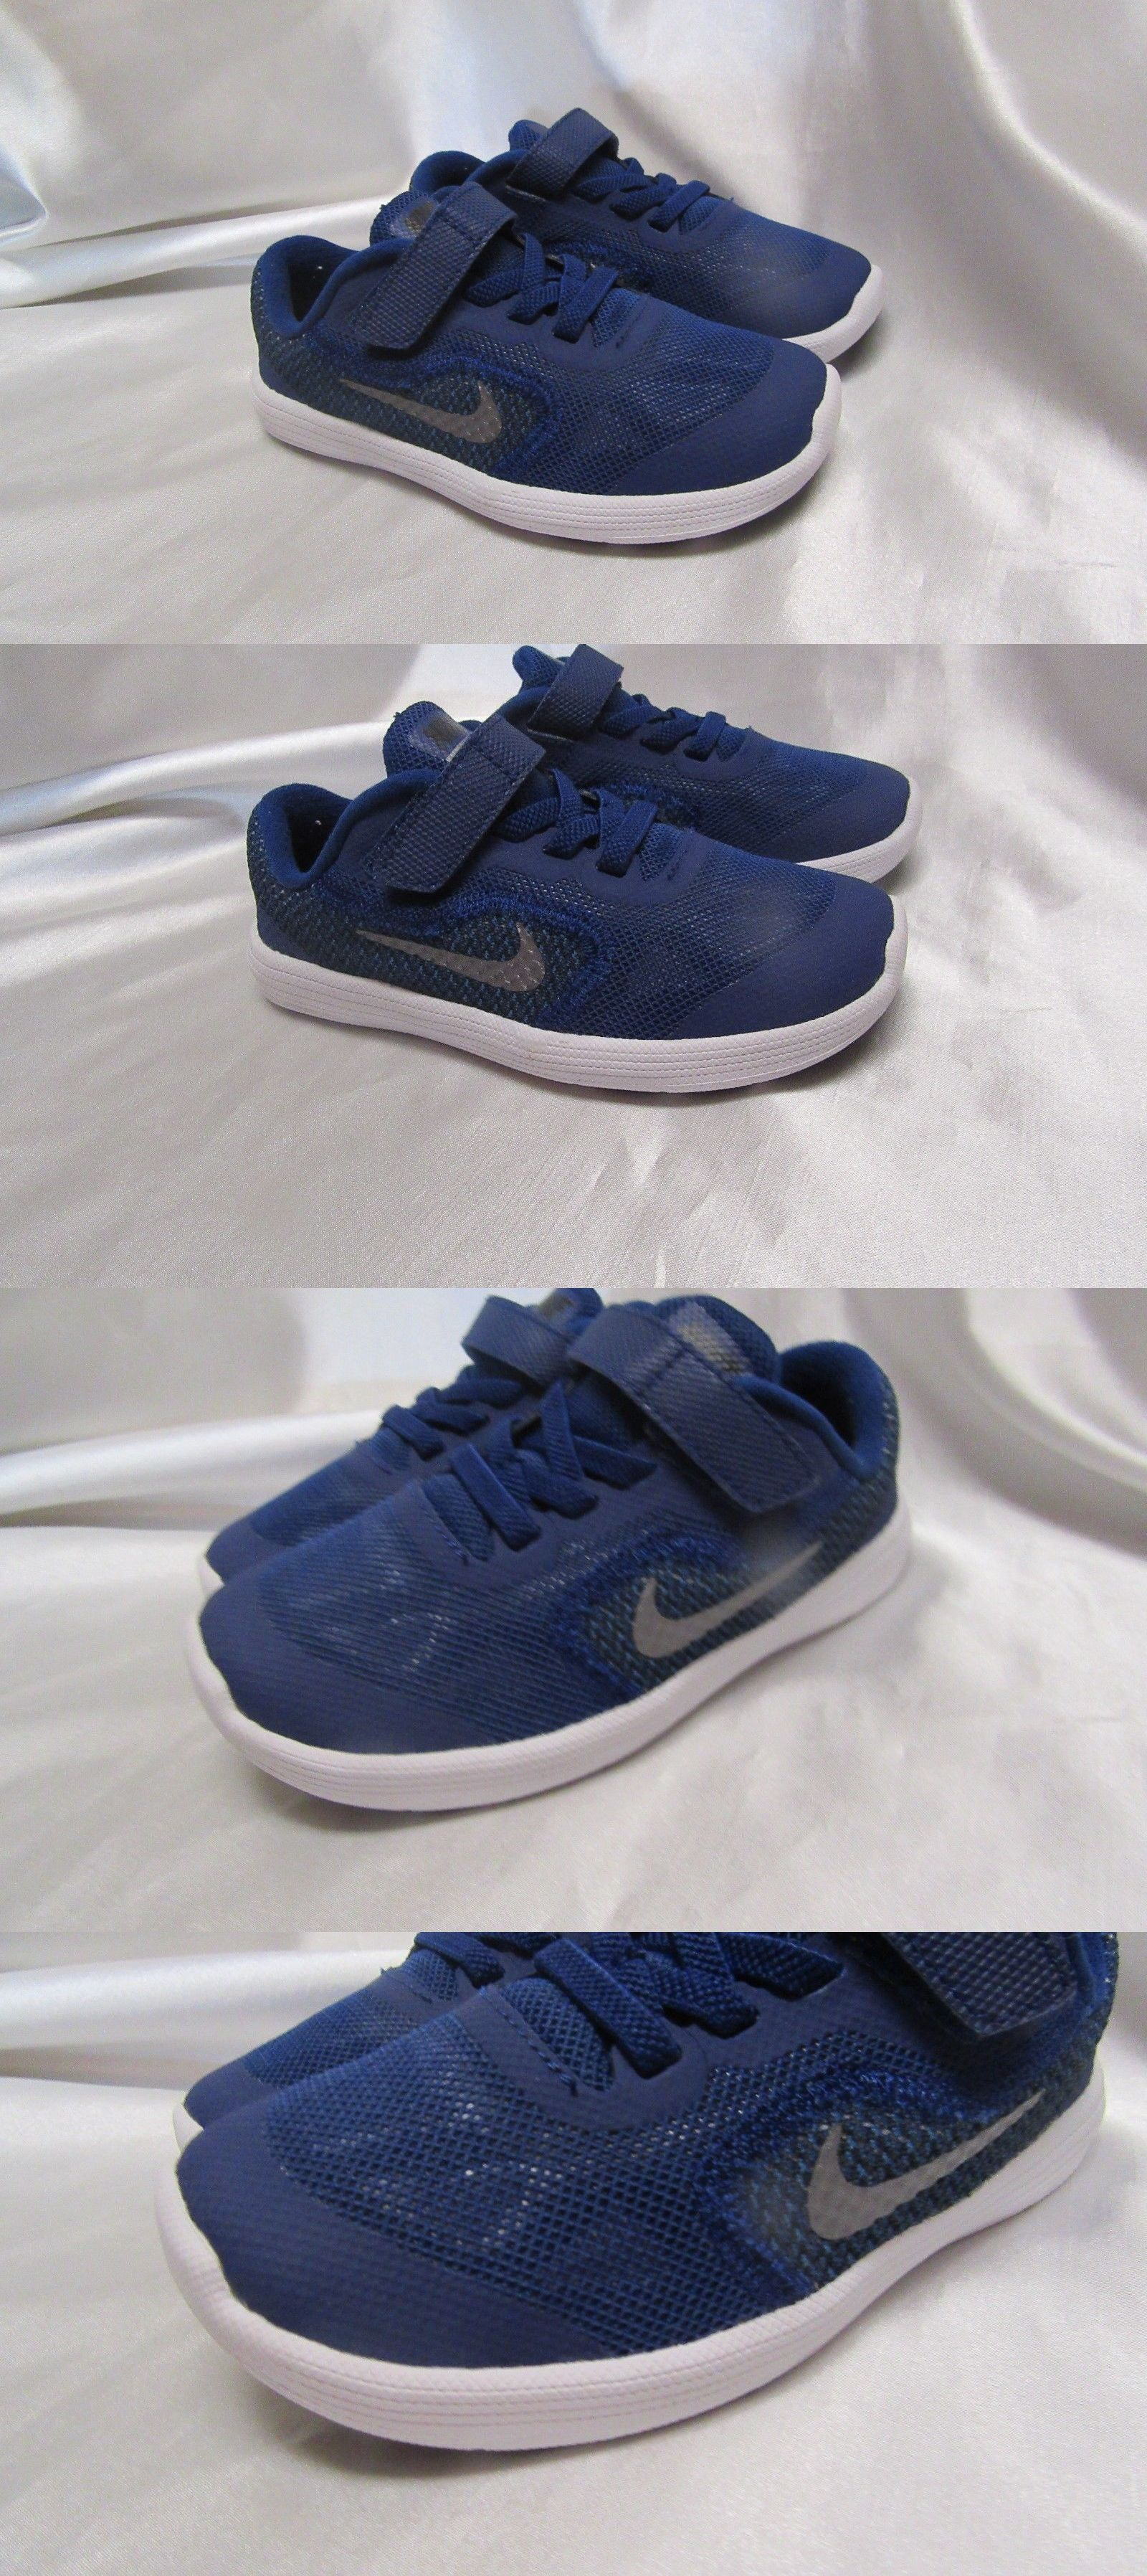 Baby Shoes Toddler Boy S Nike Revolution 3 Tdv Athletic